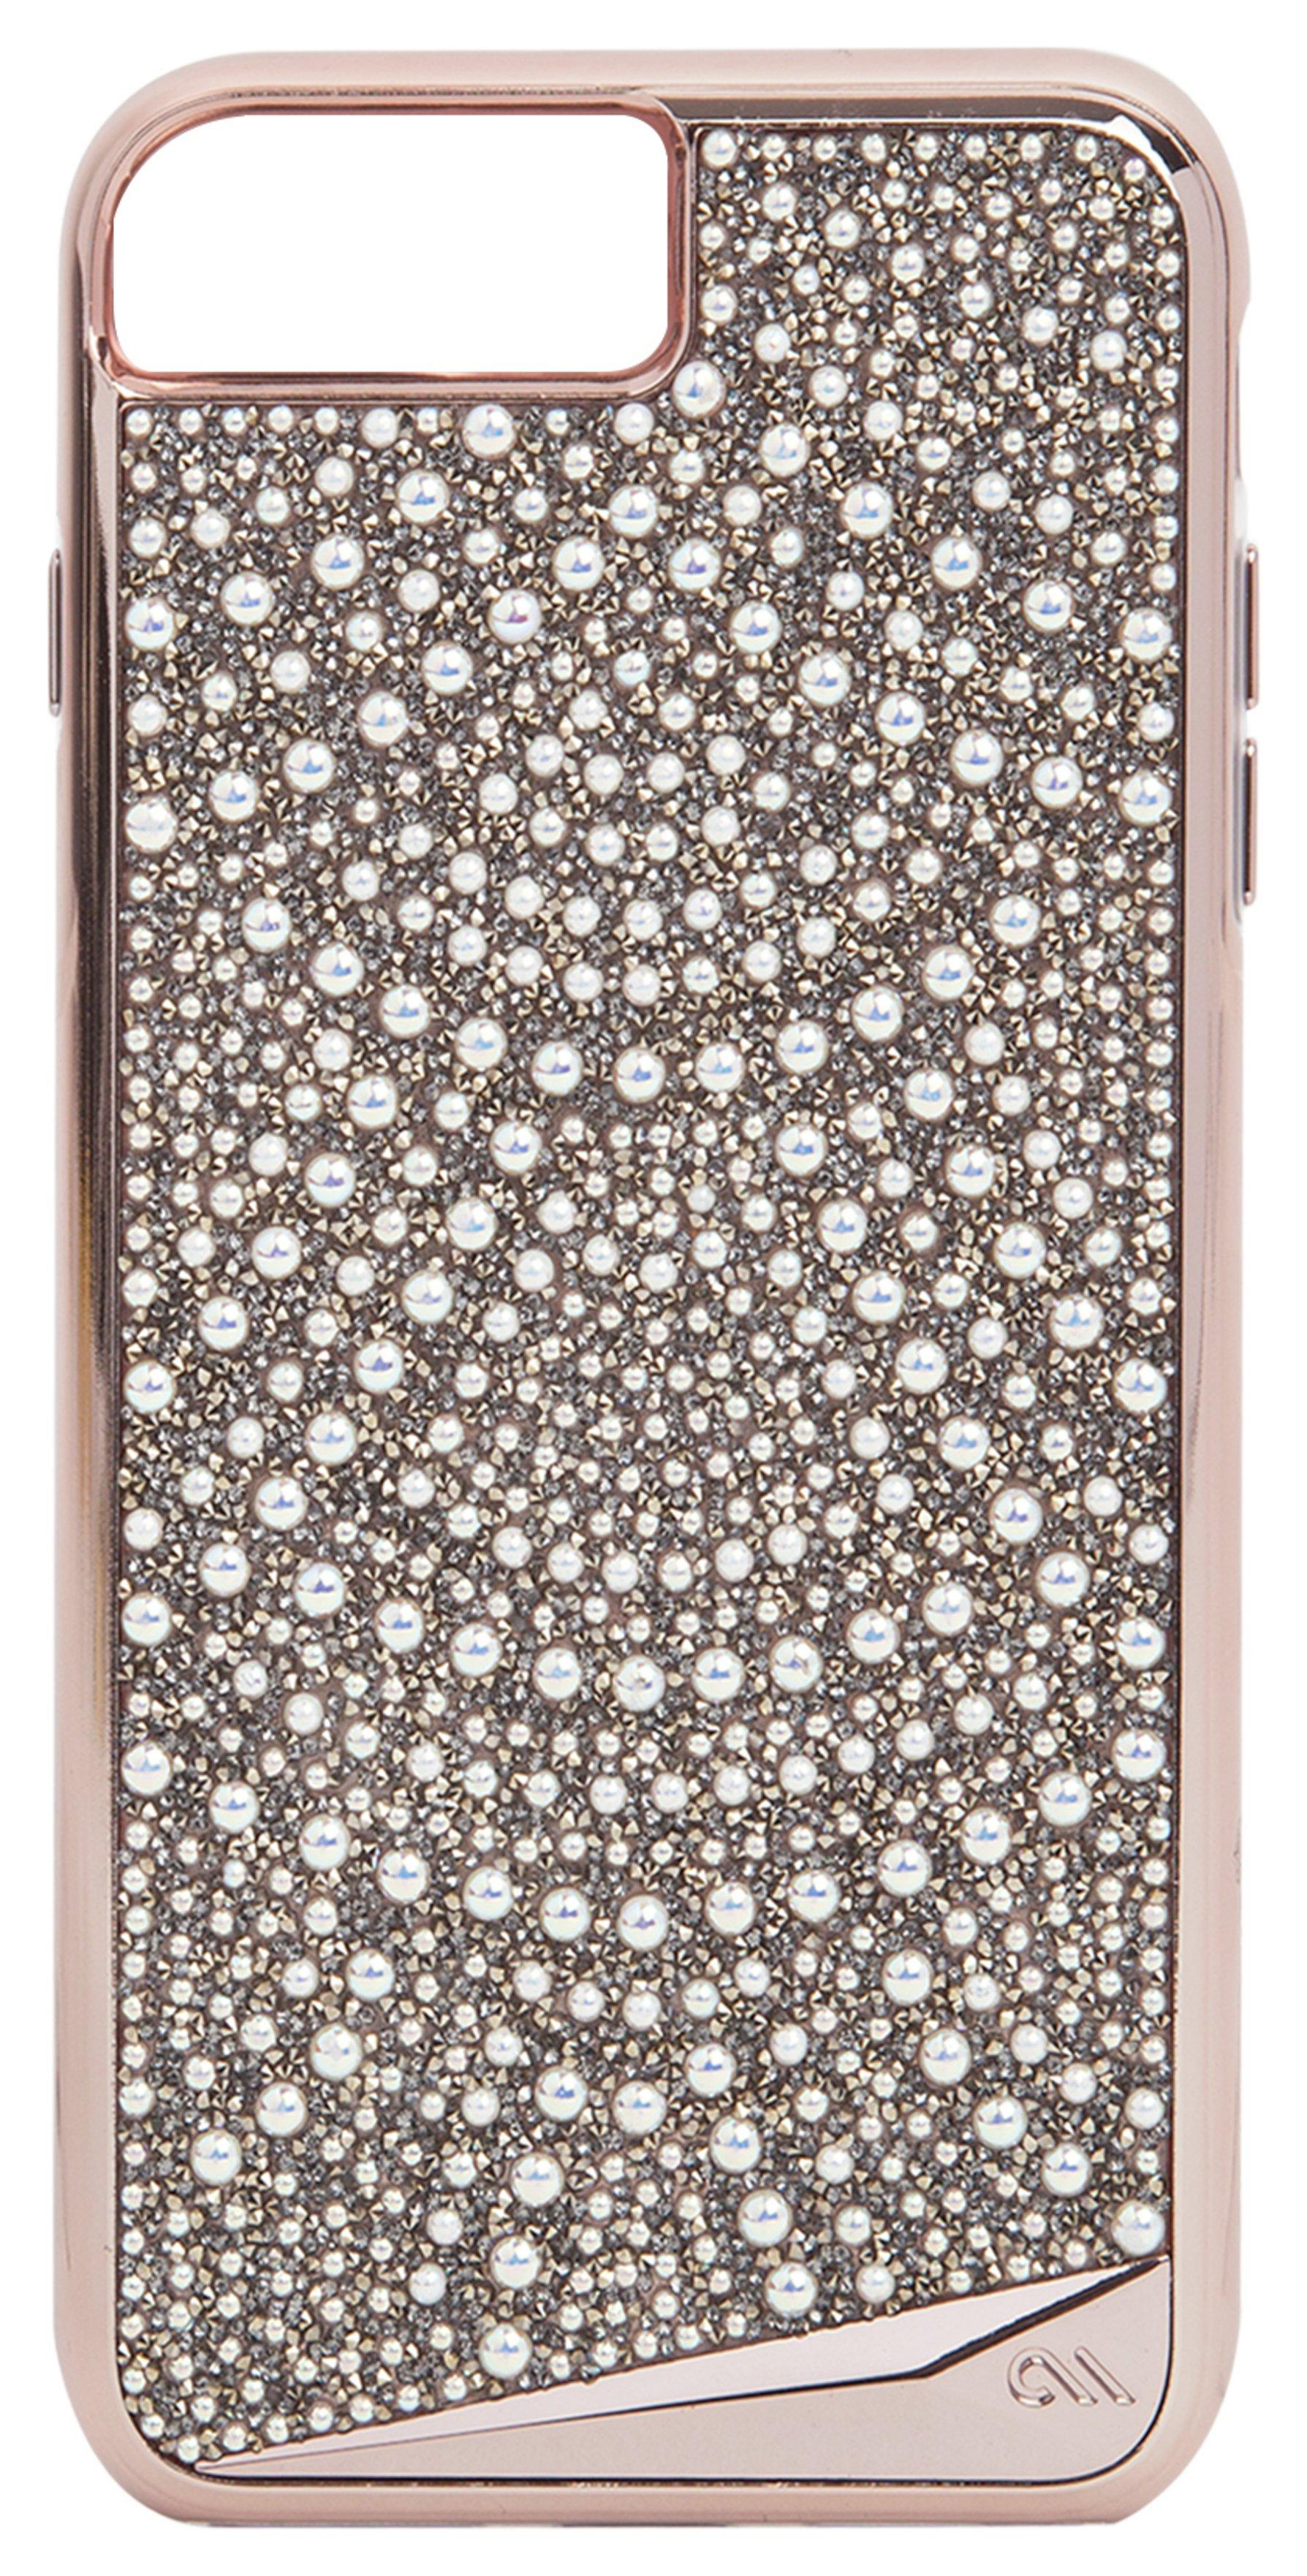 Image of Case-Mate Brilliance Tough iPhone 6+/ 6s+/7+/ 8+ Case - Lace